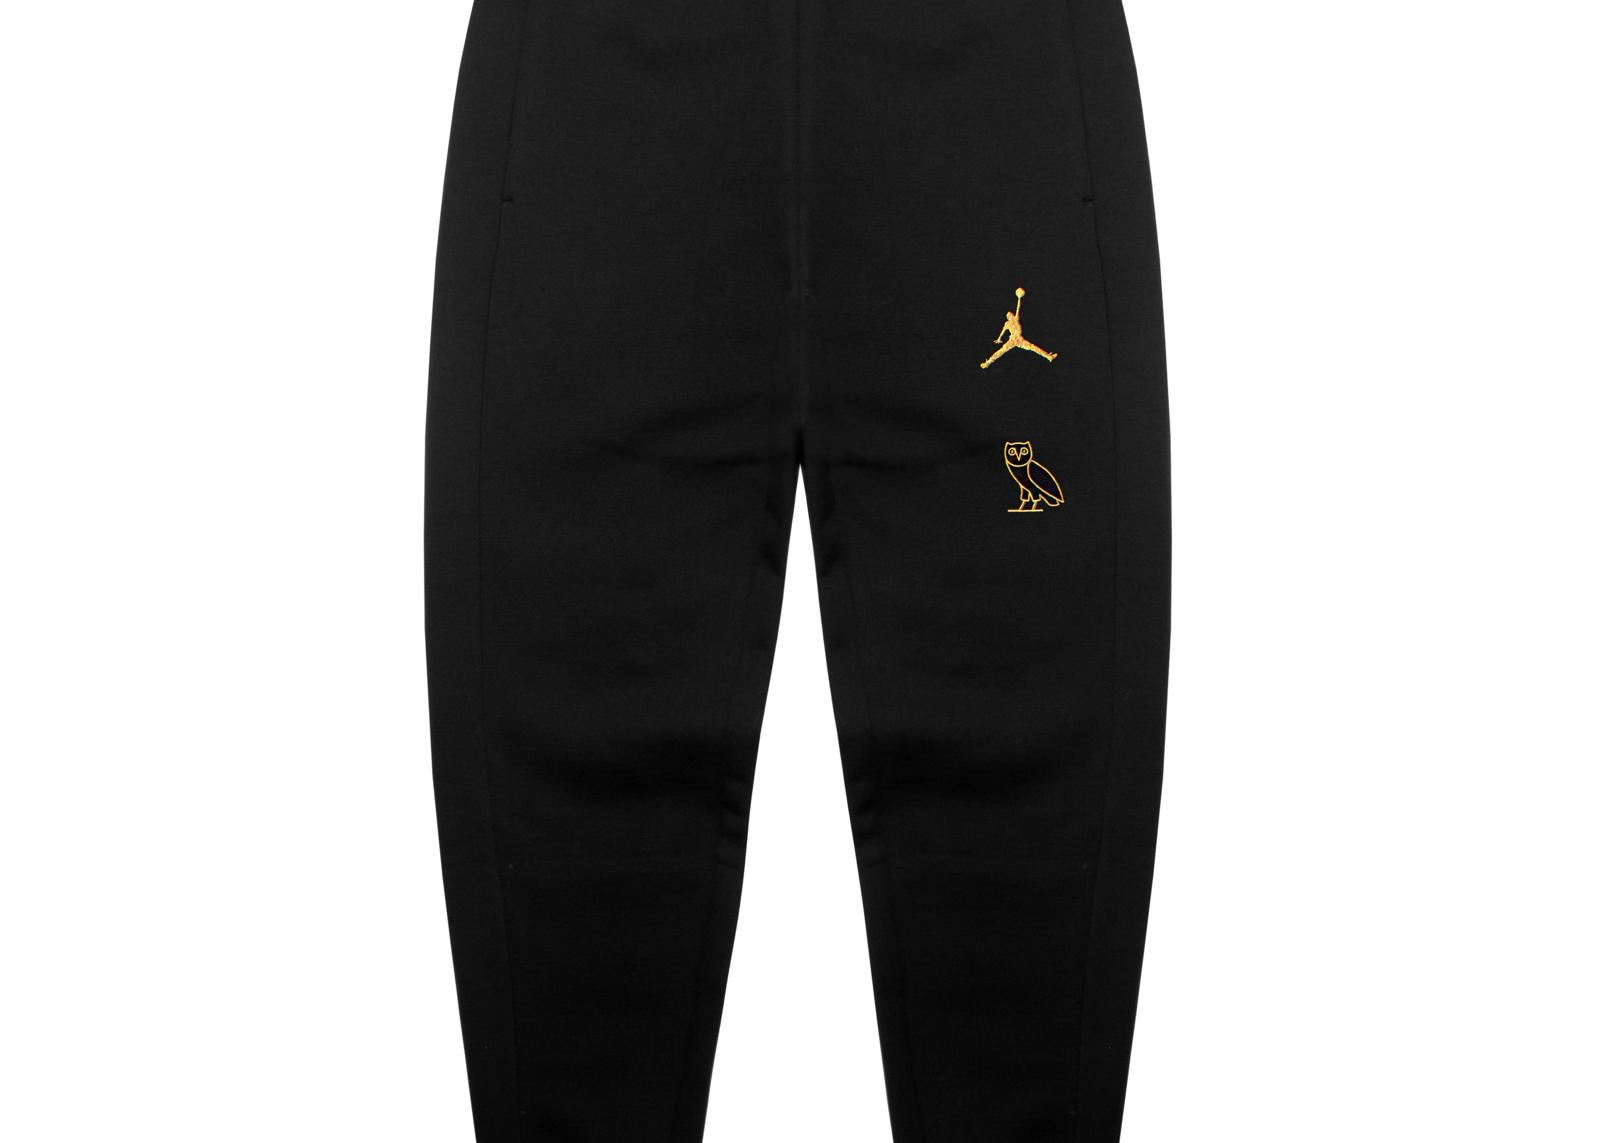 Jordan x OVO All-Star Collection - Nike News 4b1aa3347